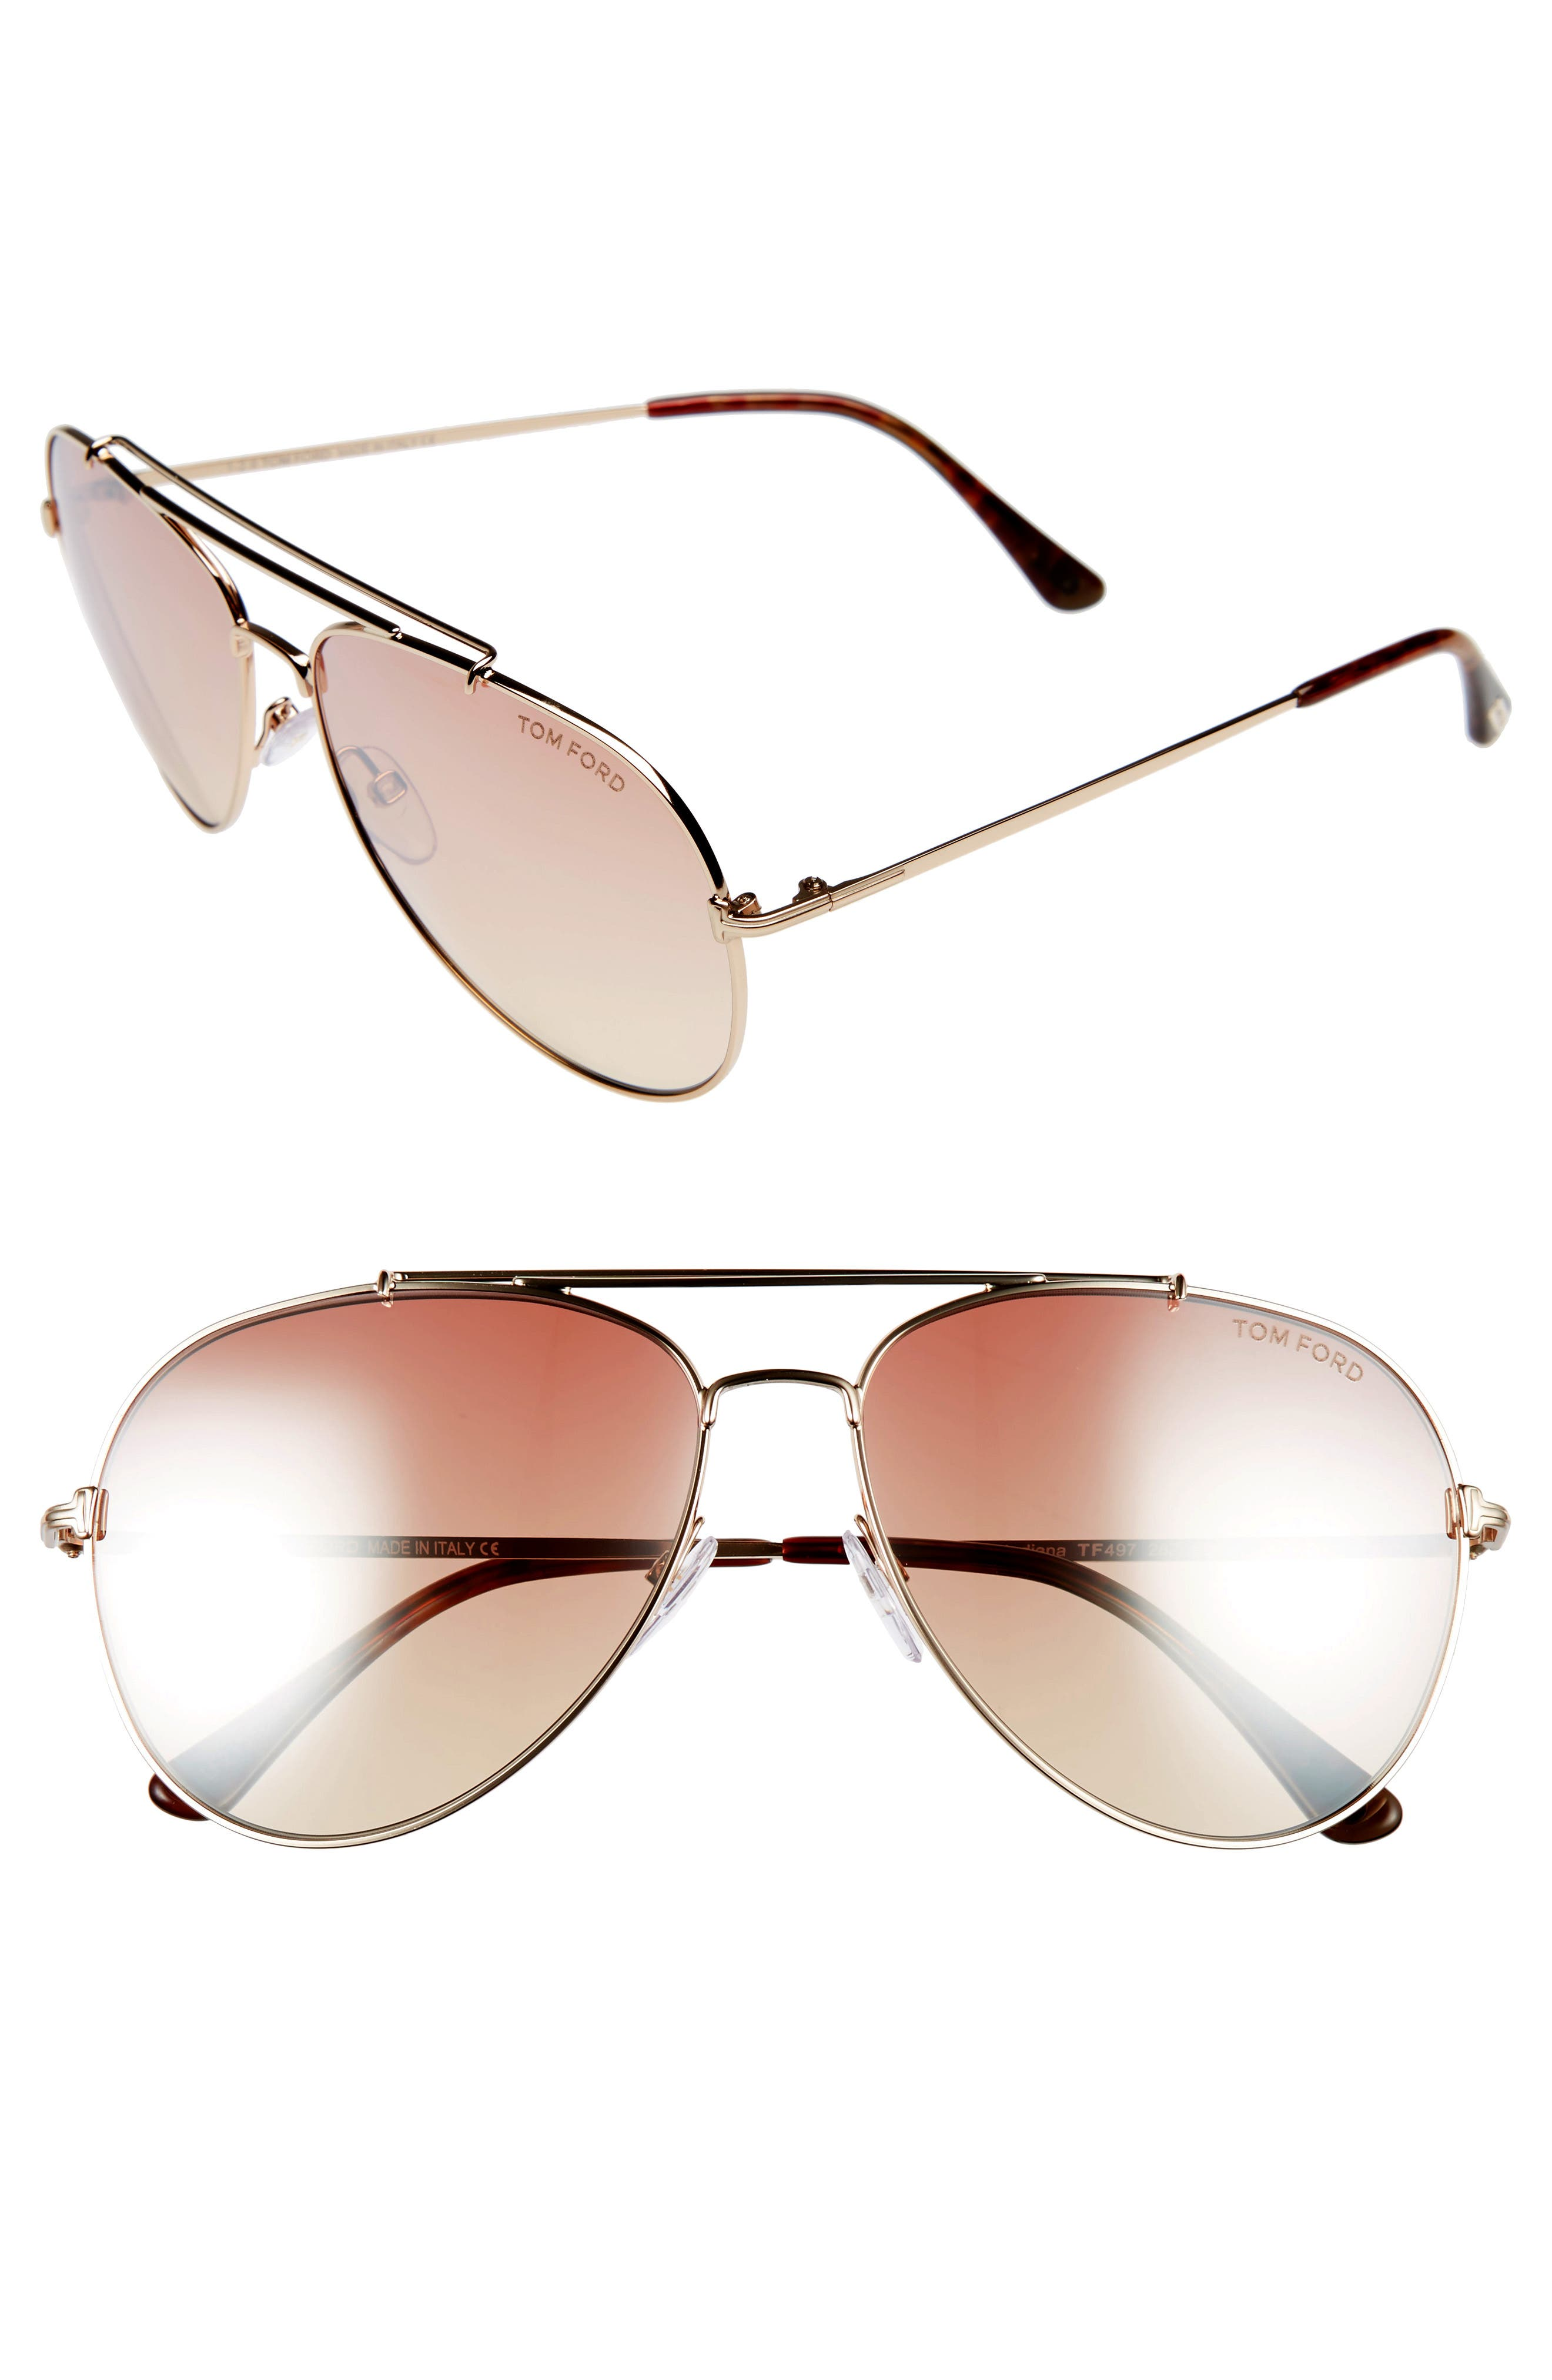 Alternate Image 1 Selected - Tom Ford Indiana 60mm Aviator Sunglasses